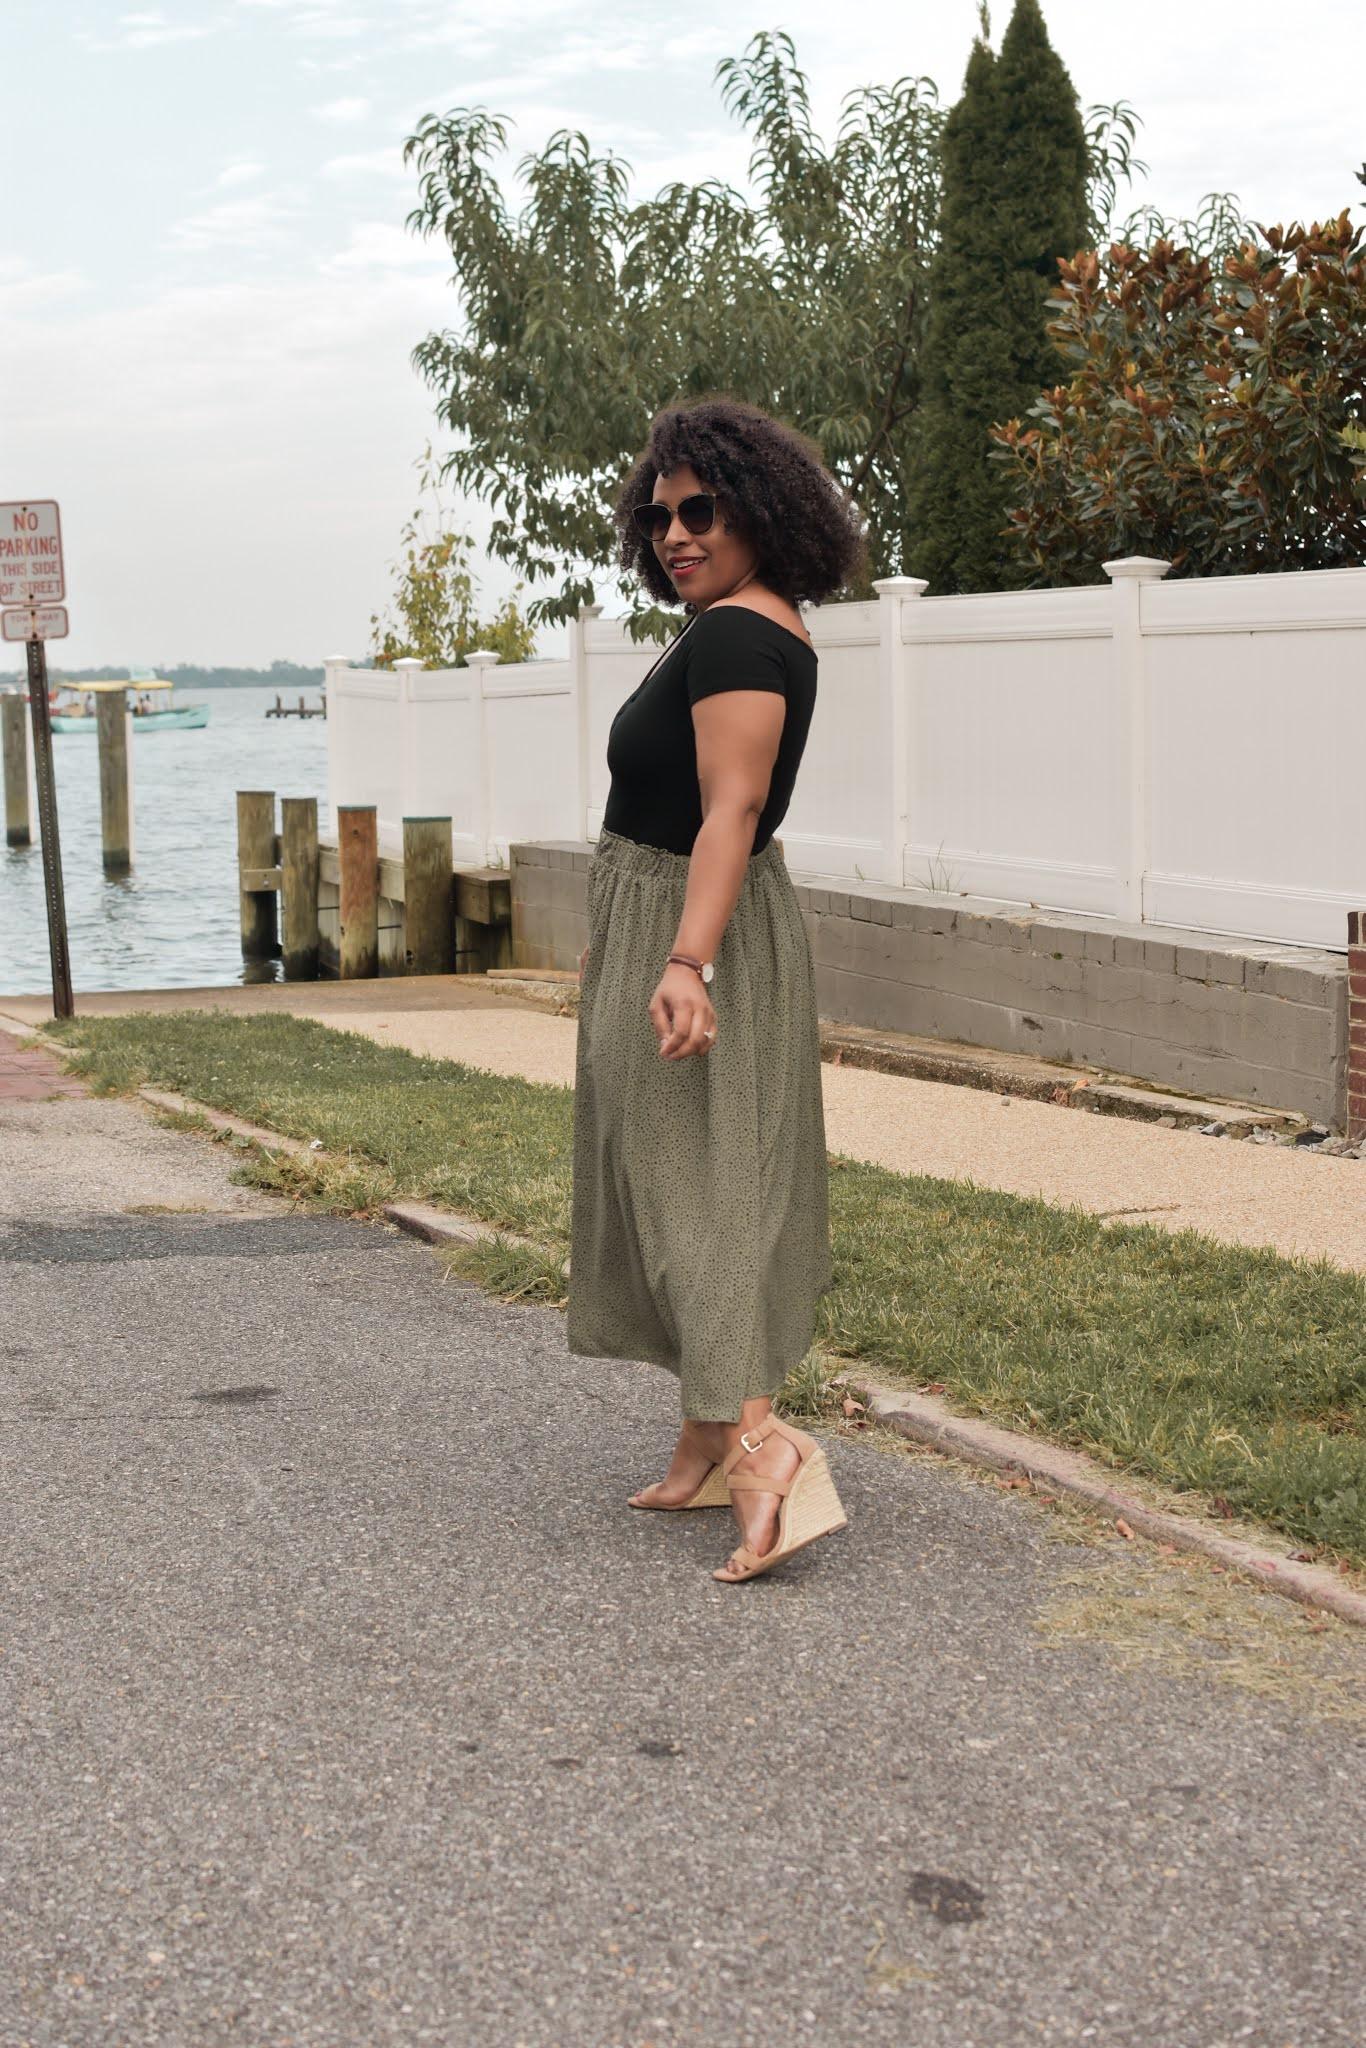 OOTD: Flared Midi Skirt